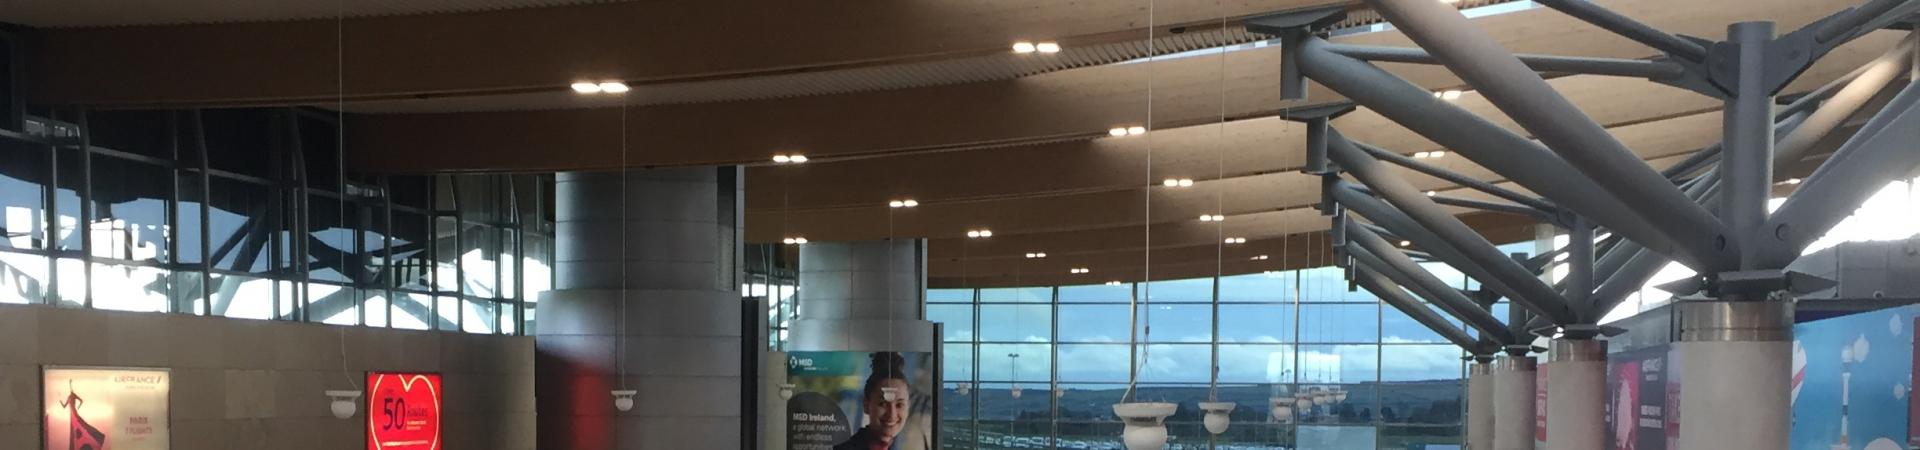 Cork Airport, County Cork